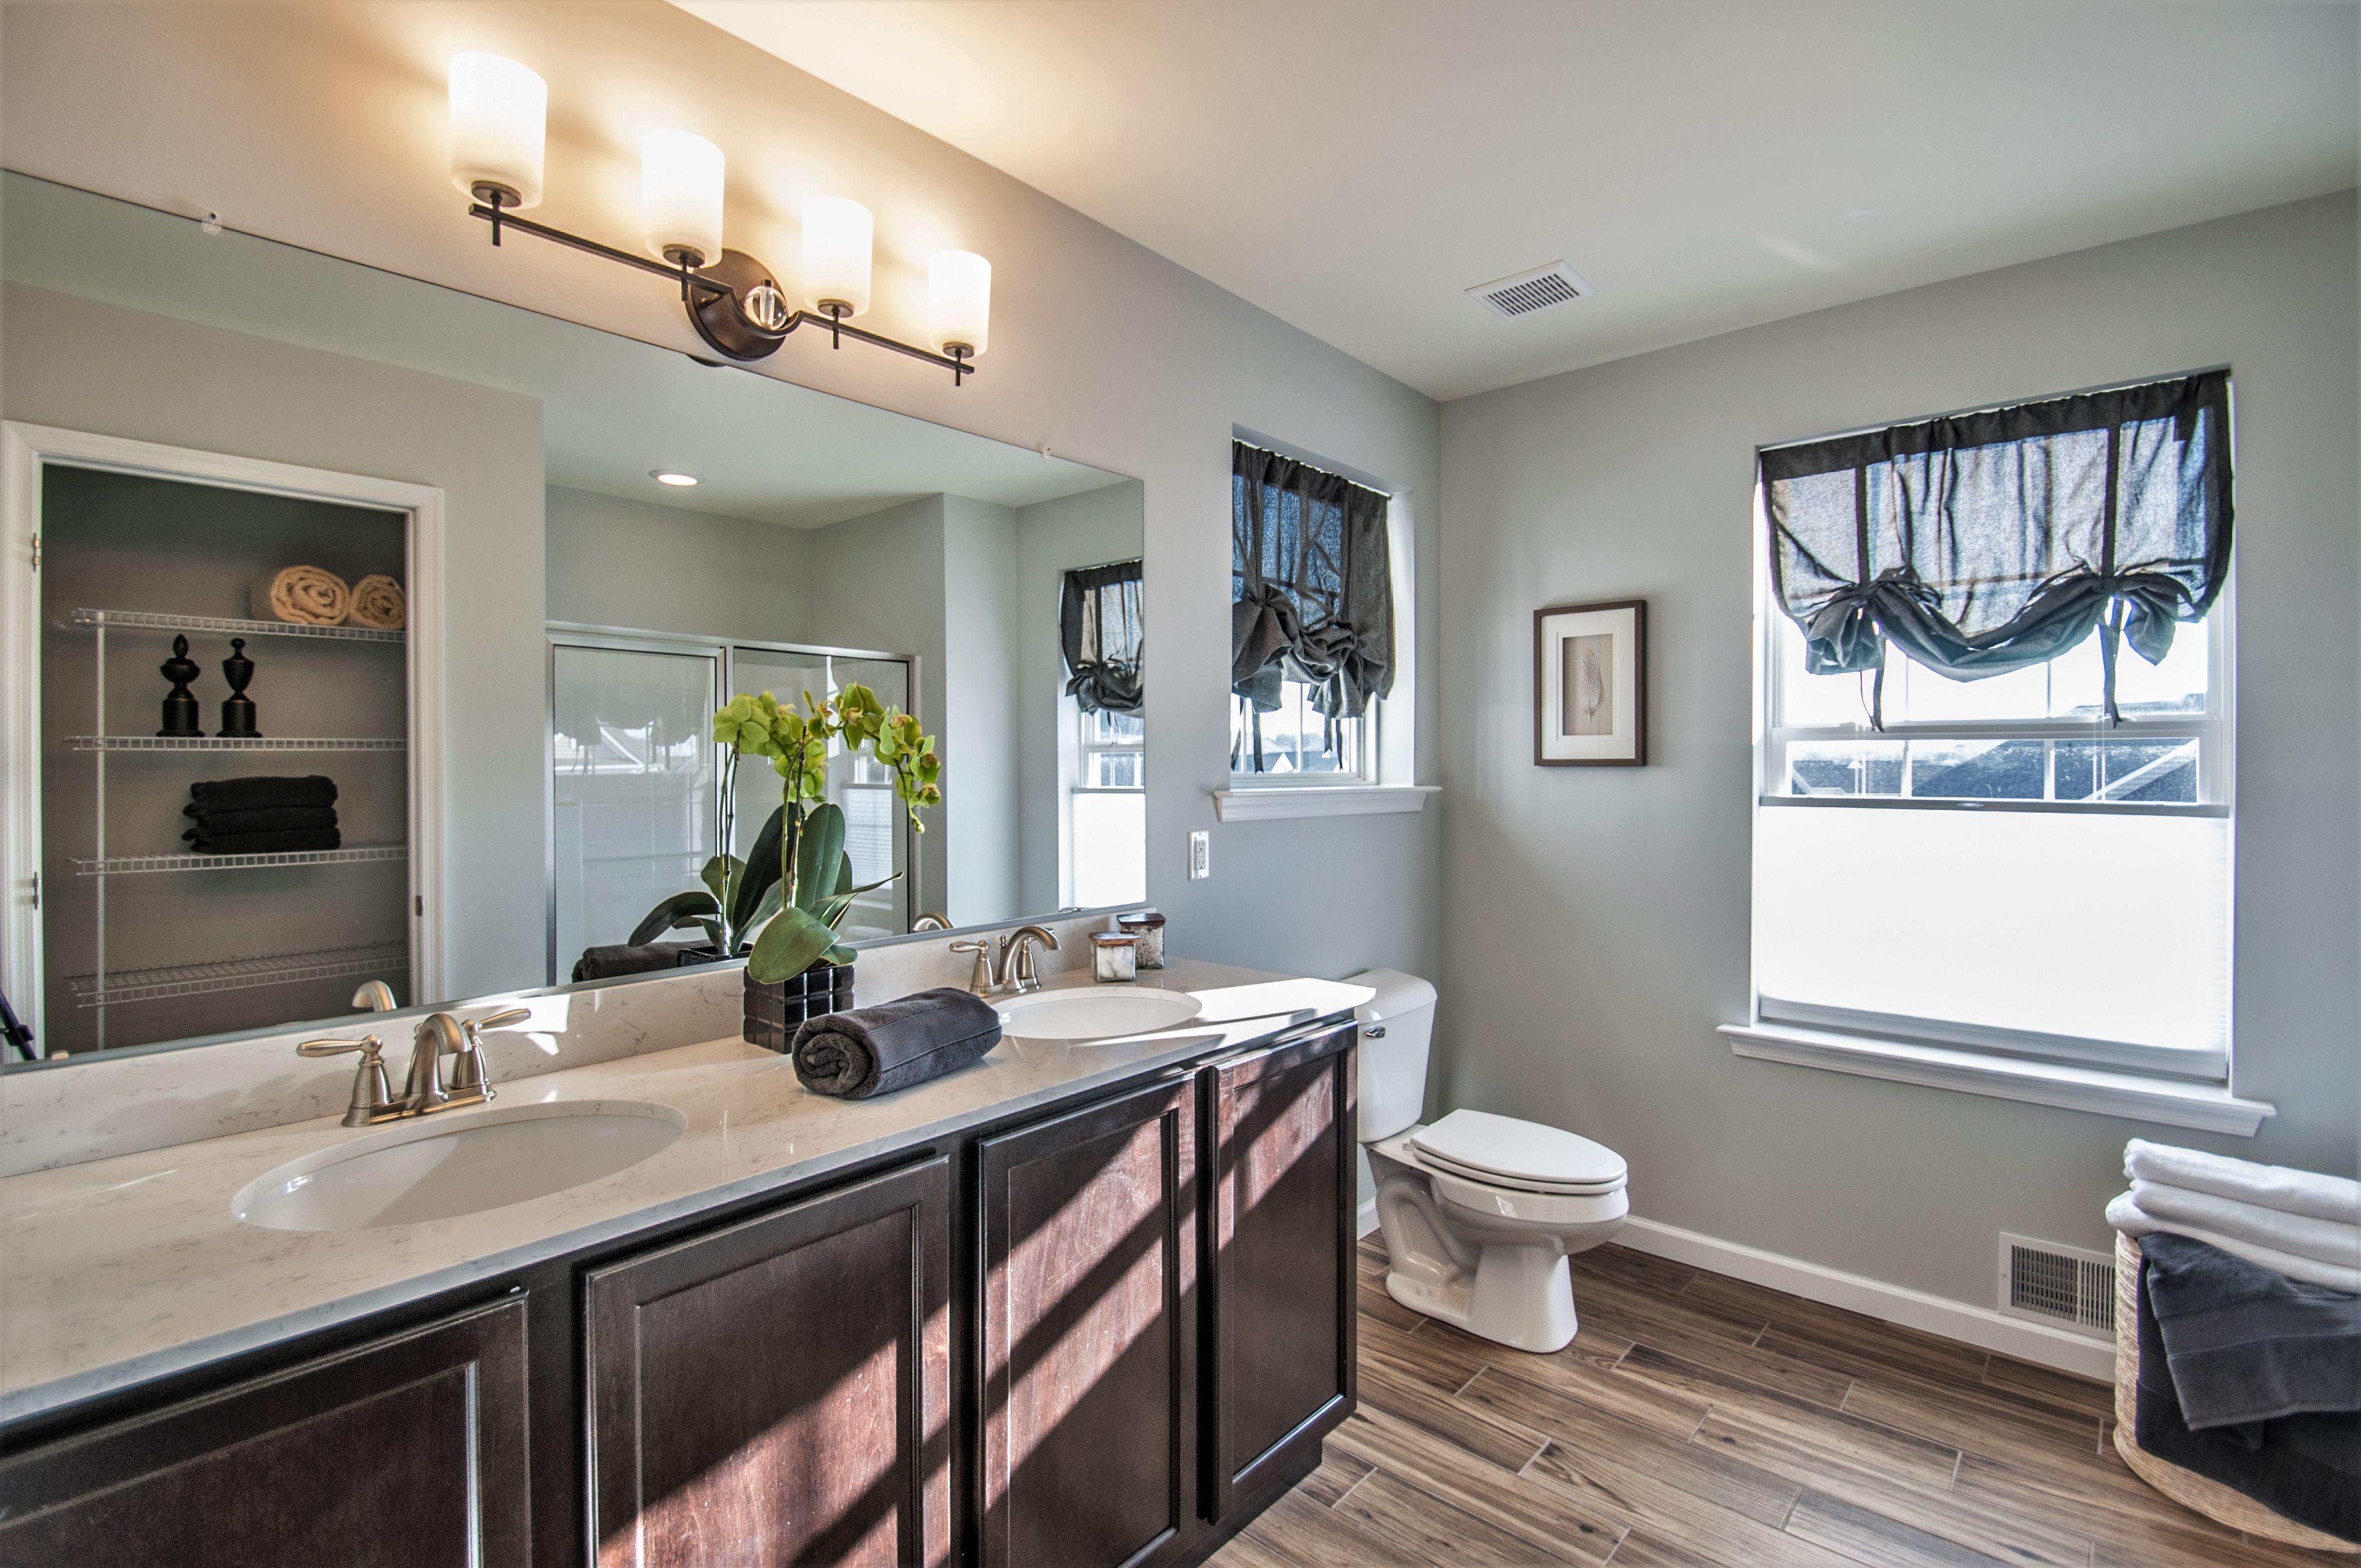 Bathroom featured in the Primrose By Sal Lapio Homes in Allentown-Bethlehem, PA